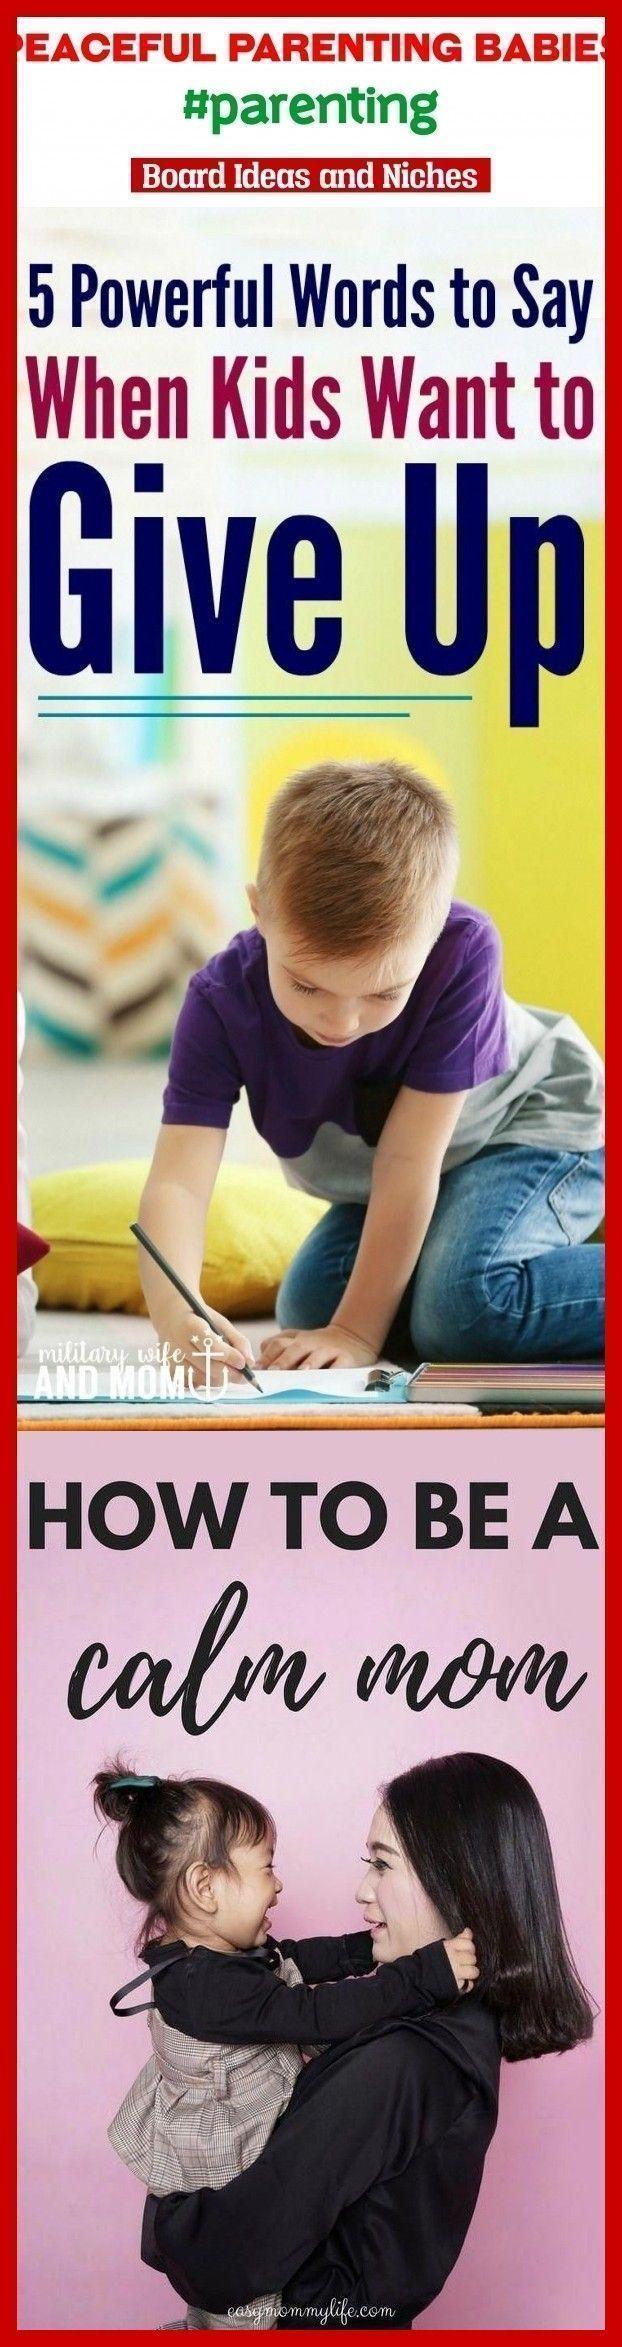 Photo of Child development  #raising #quotes #parenting raising kids quotes parenting, ra…